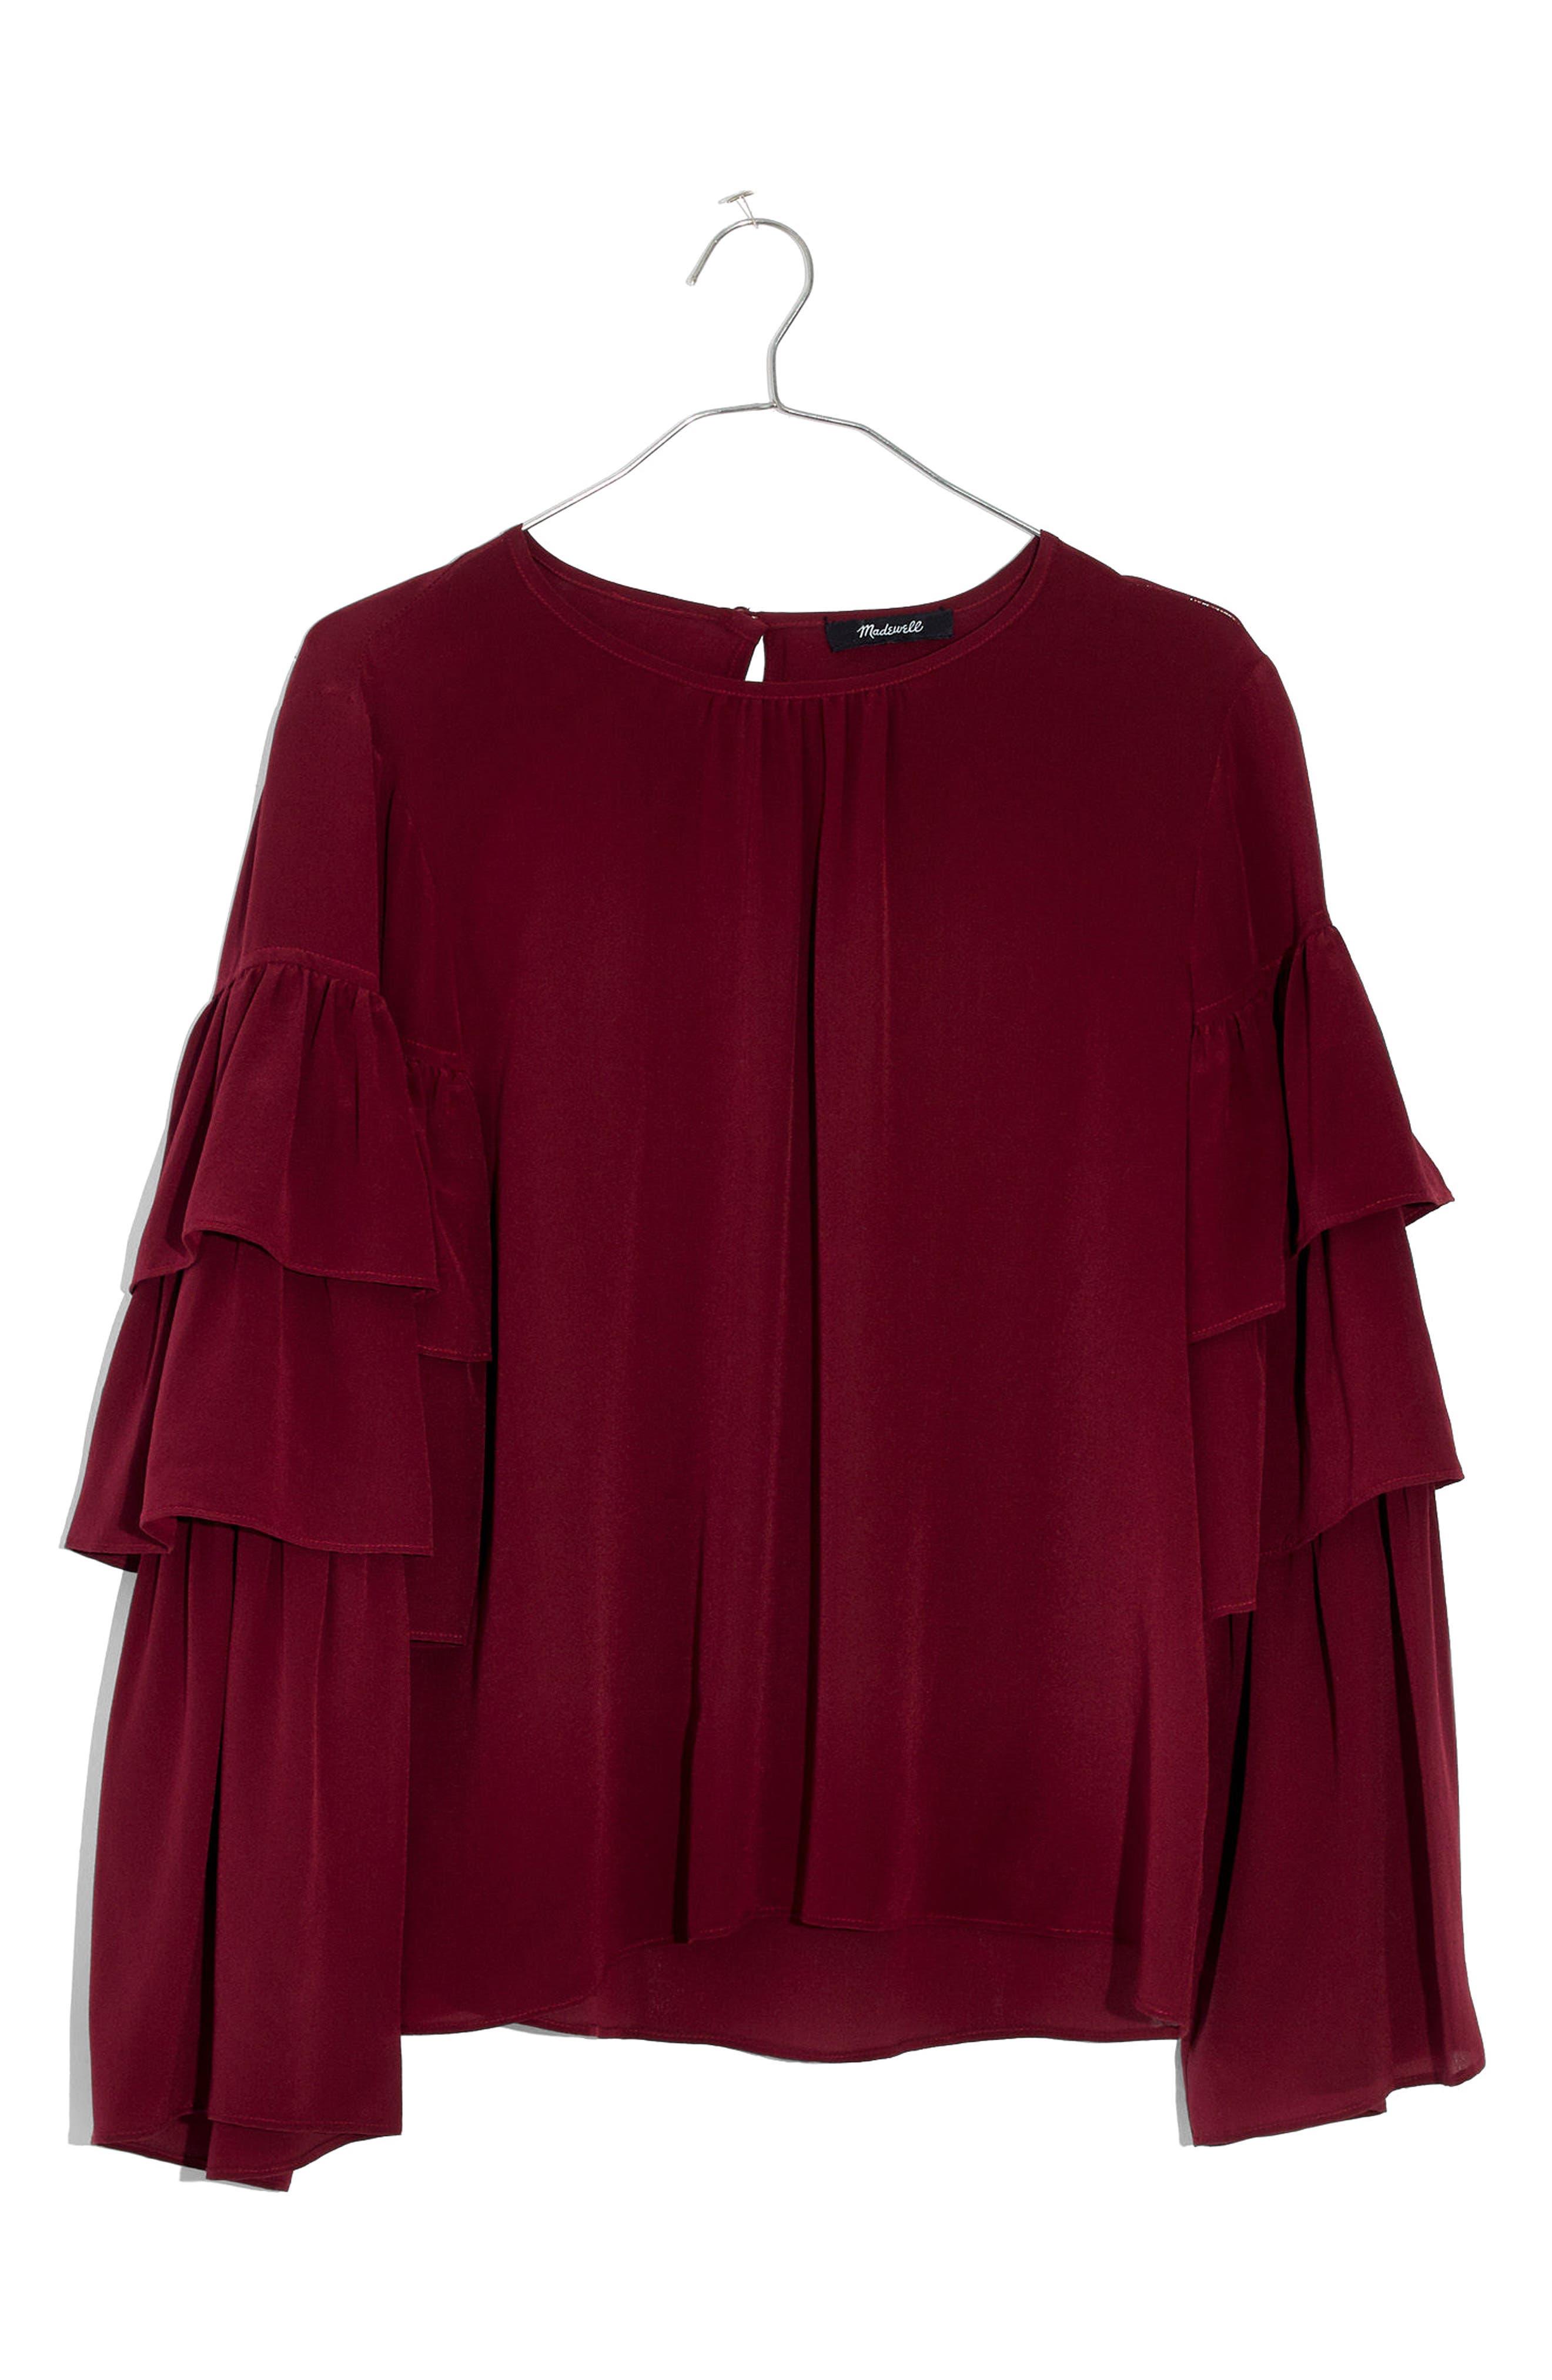 Alternate Image 1 Selected - Madewell Ruffle Sleeve Silk Top